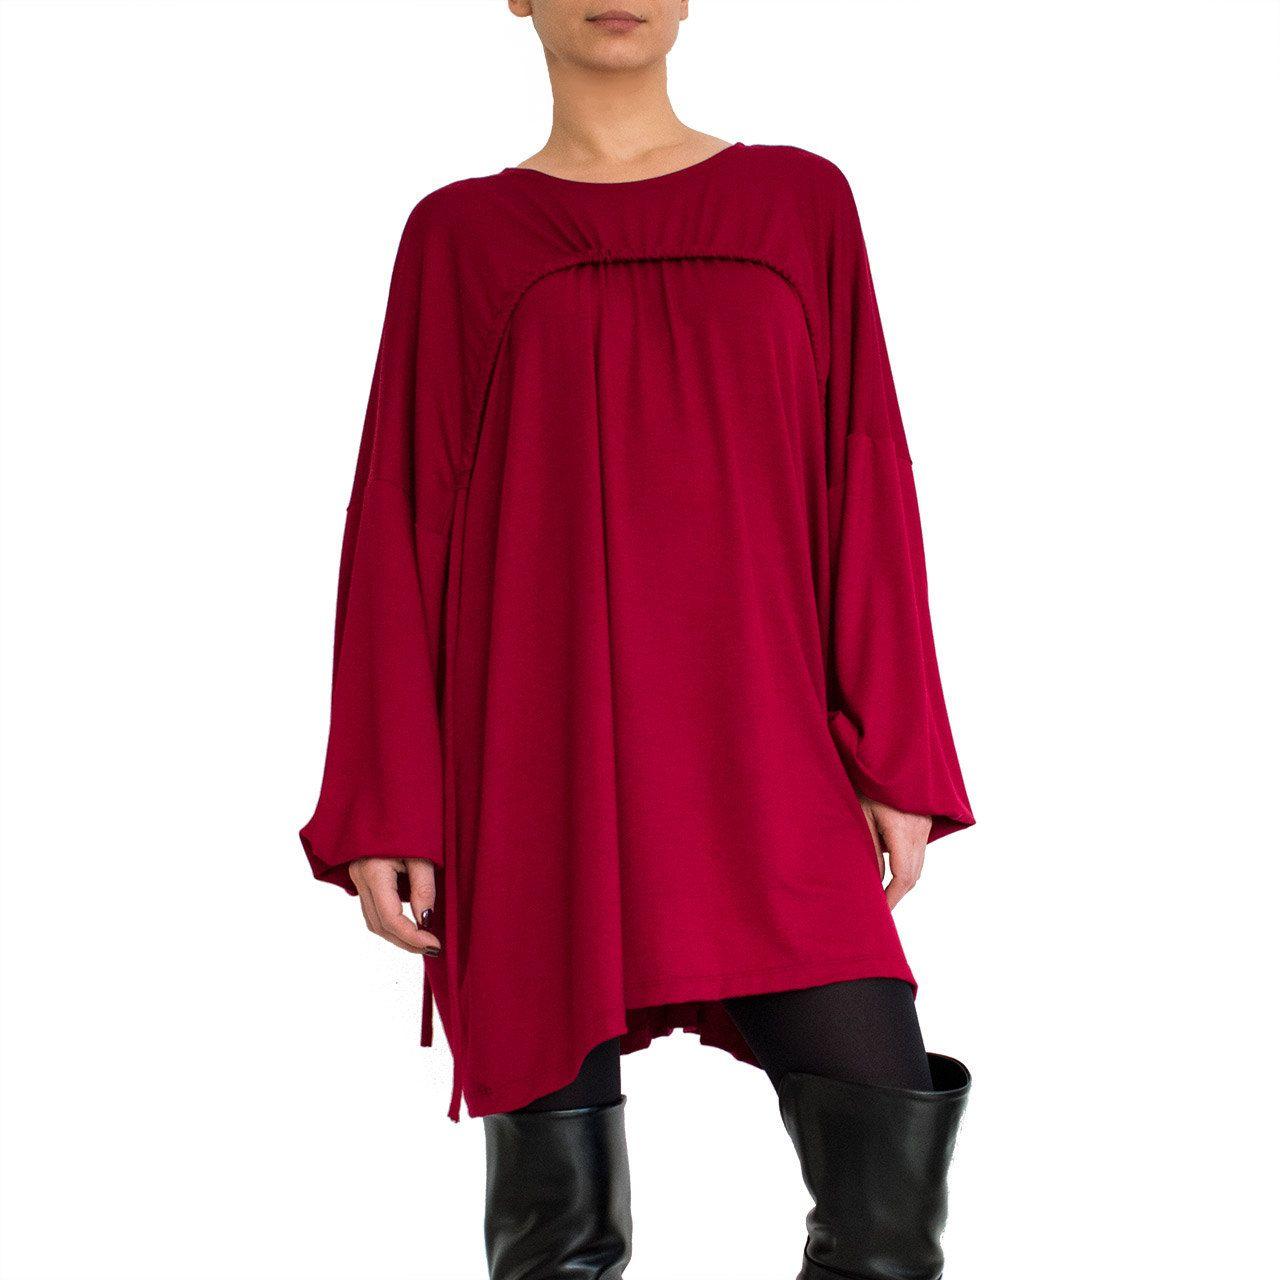 Drape oversized tunic dress plus size top long sleeve tunic top red